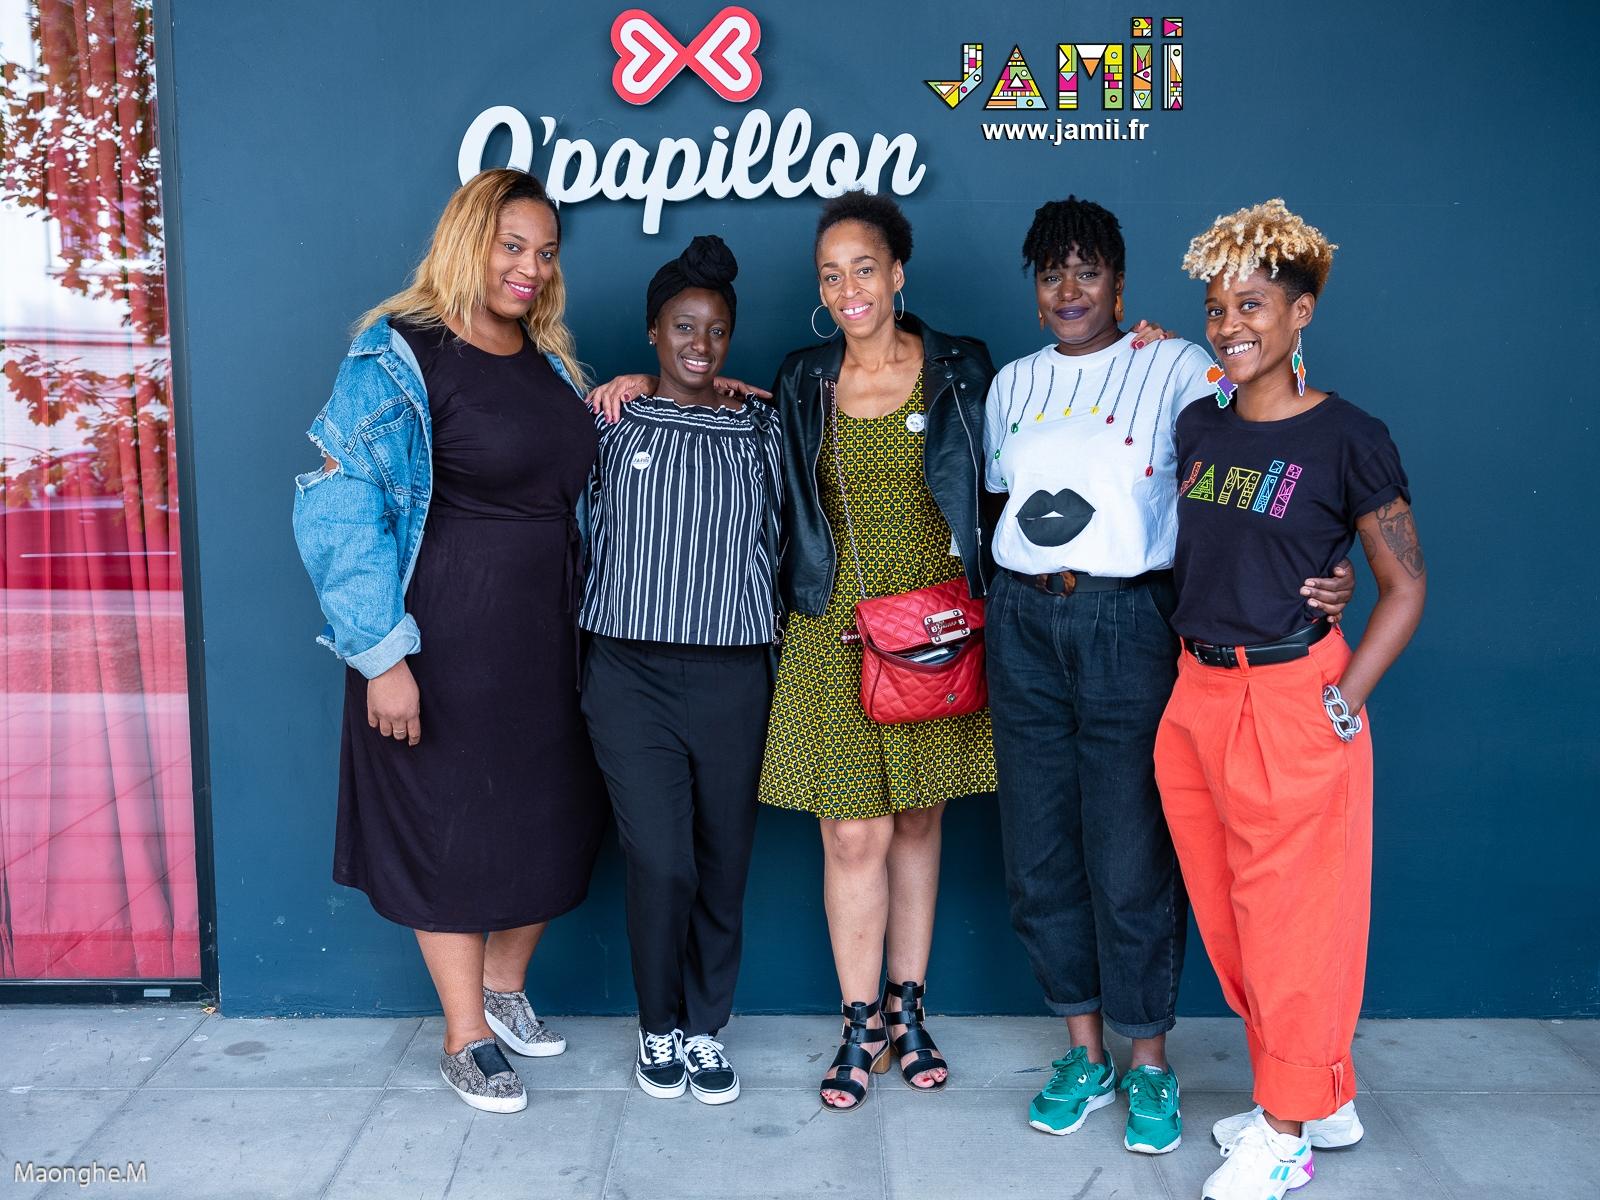 jamii-party-2308-51